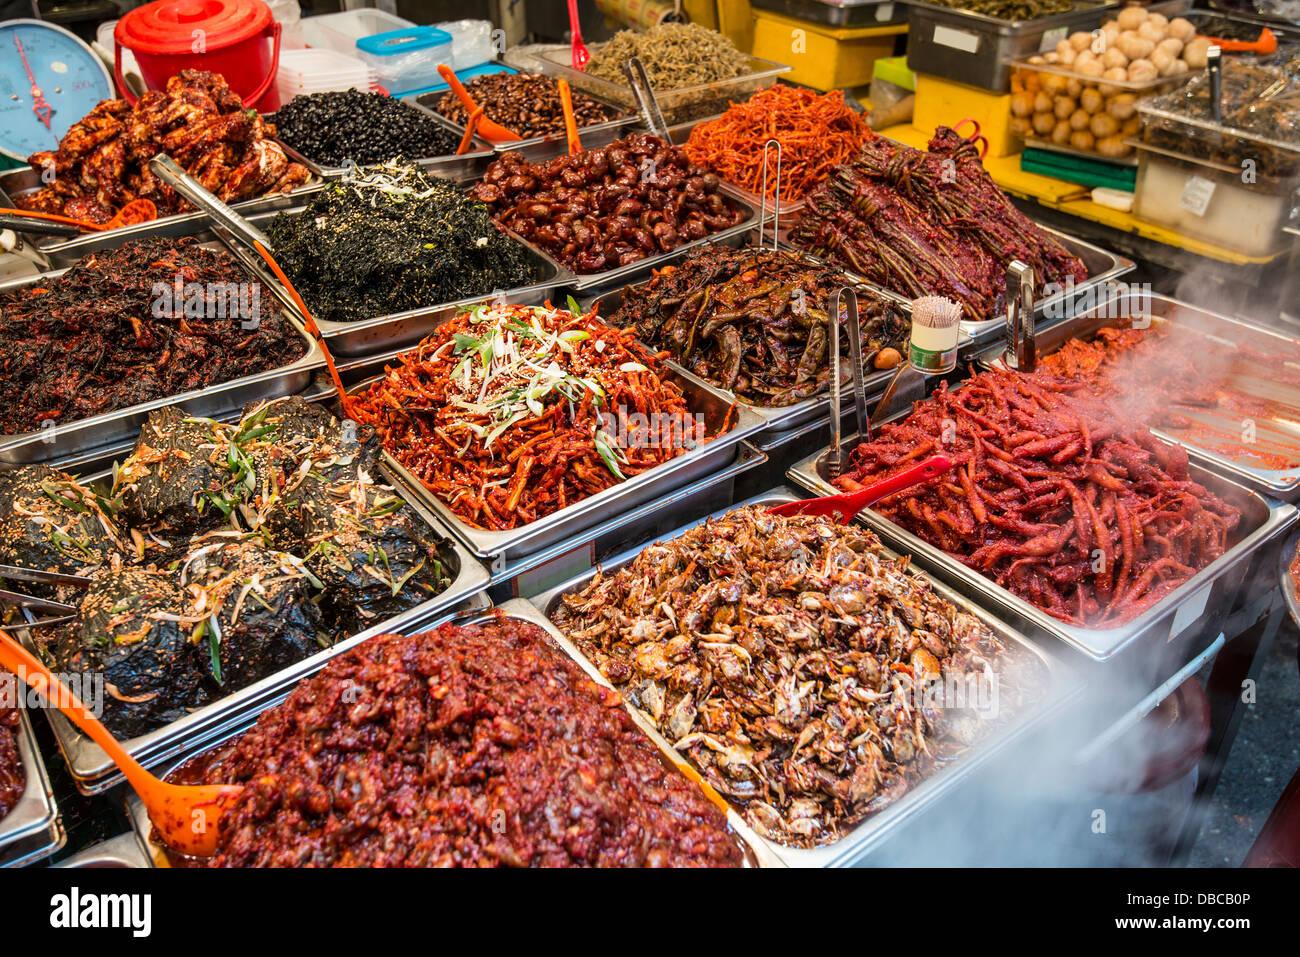 Food on display at Gwangjang Market in Seoul, South Korea. - Stock Image